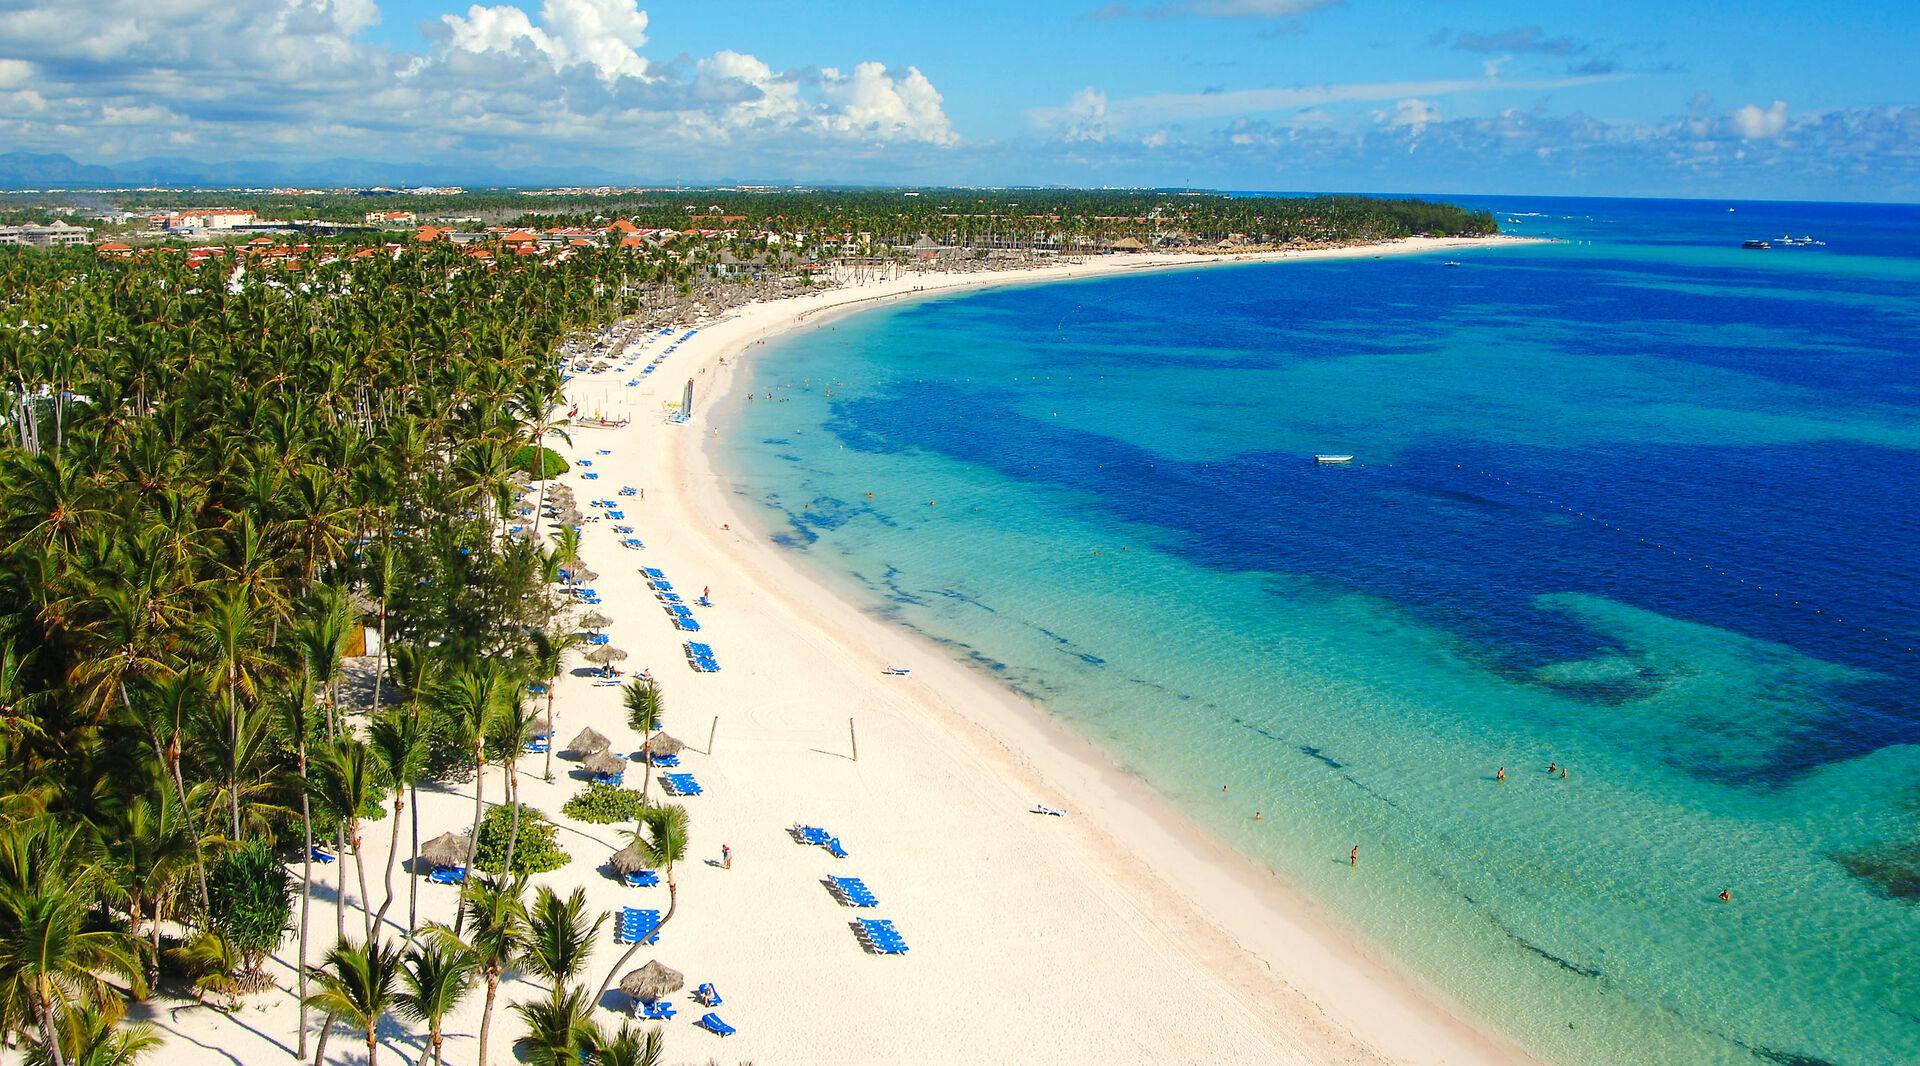 Melia Punta Cana Beach - A Wellness Inclusive Resort - 5*